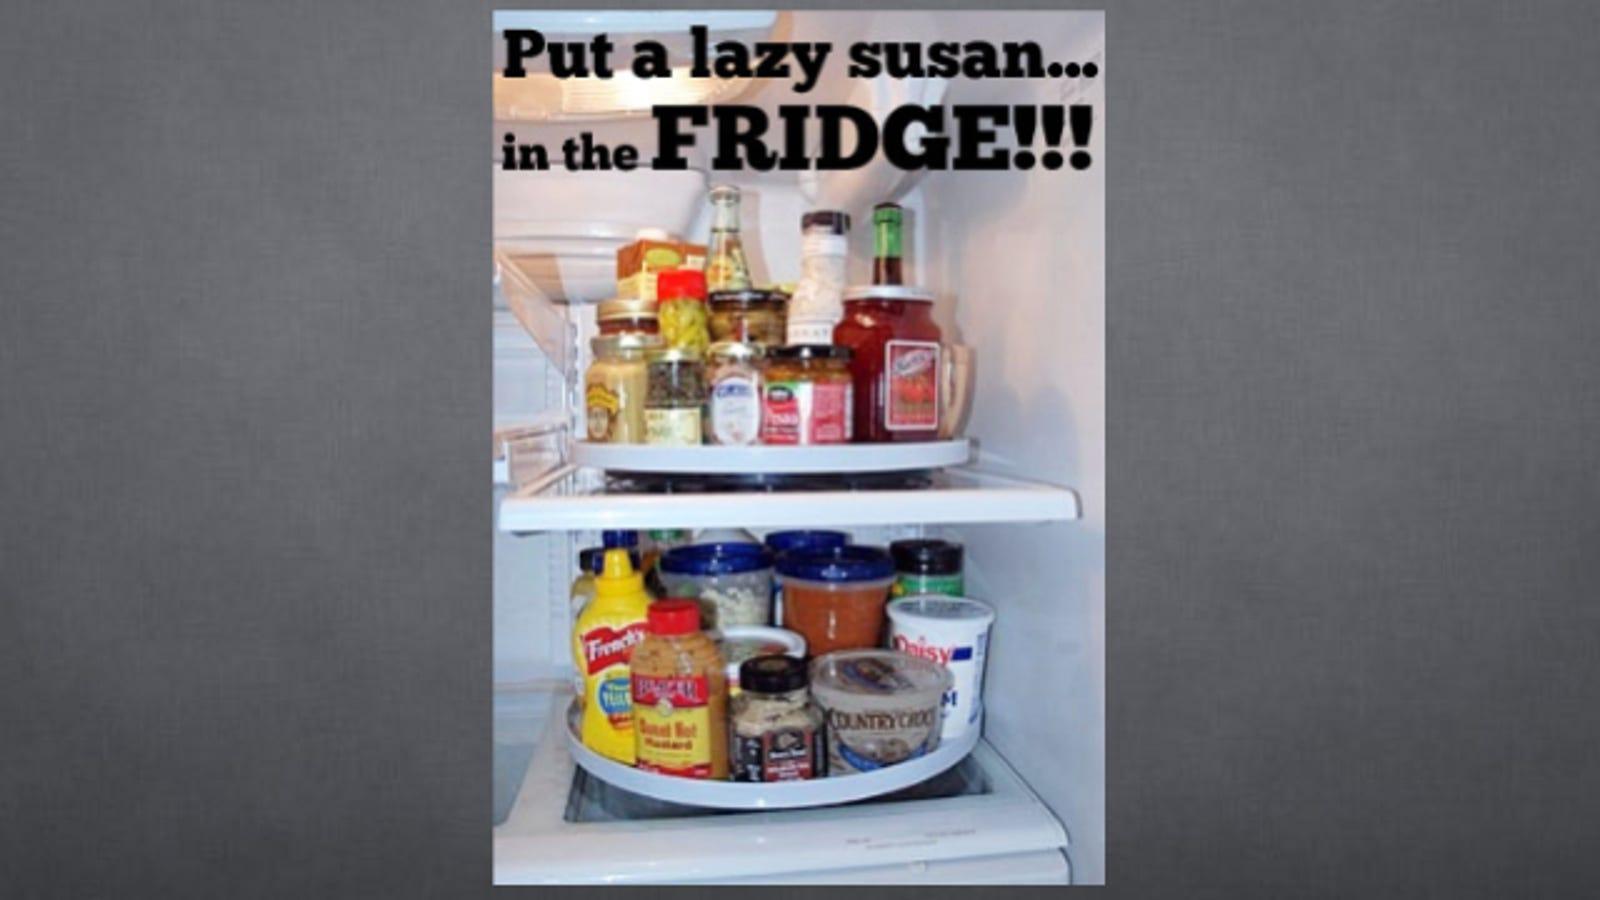 Preferred Organize Your Fridge With a Lazy Susan GR37